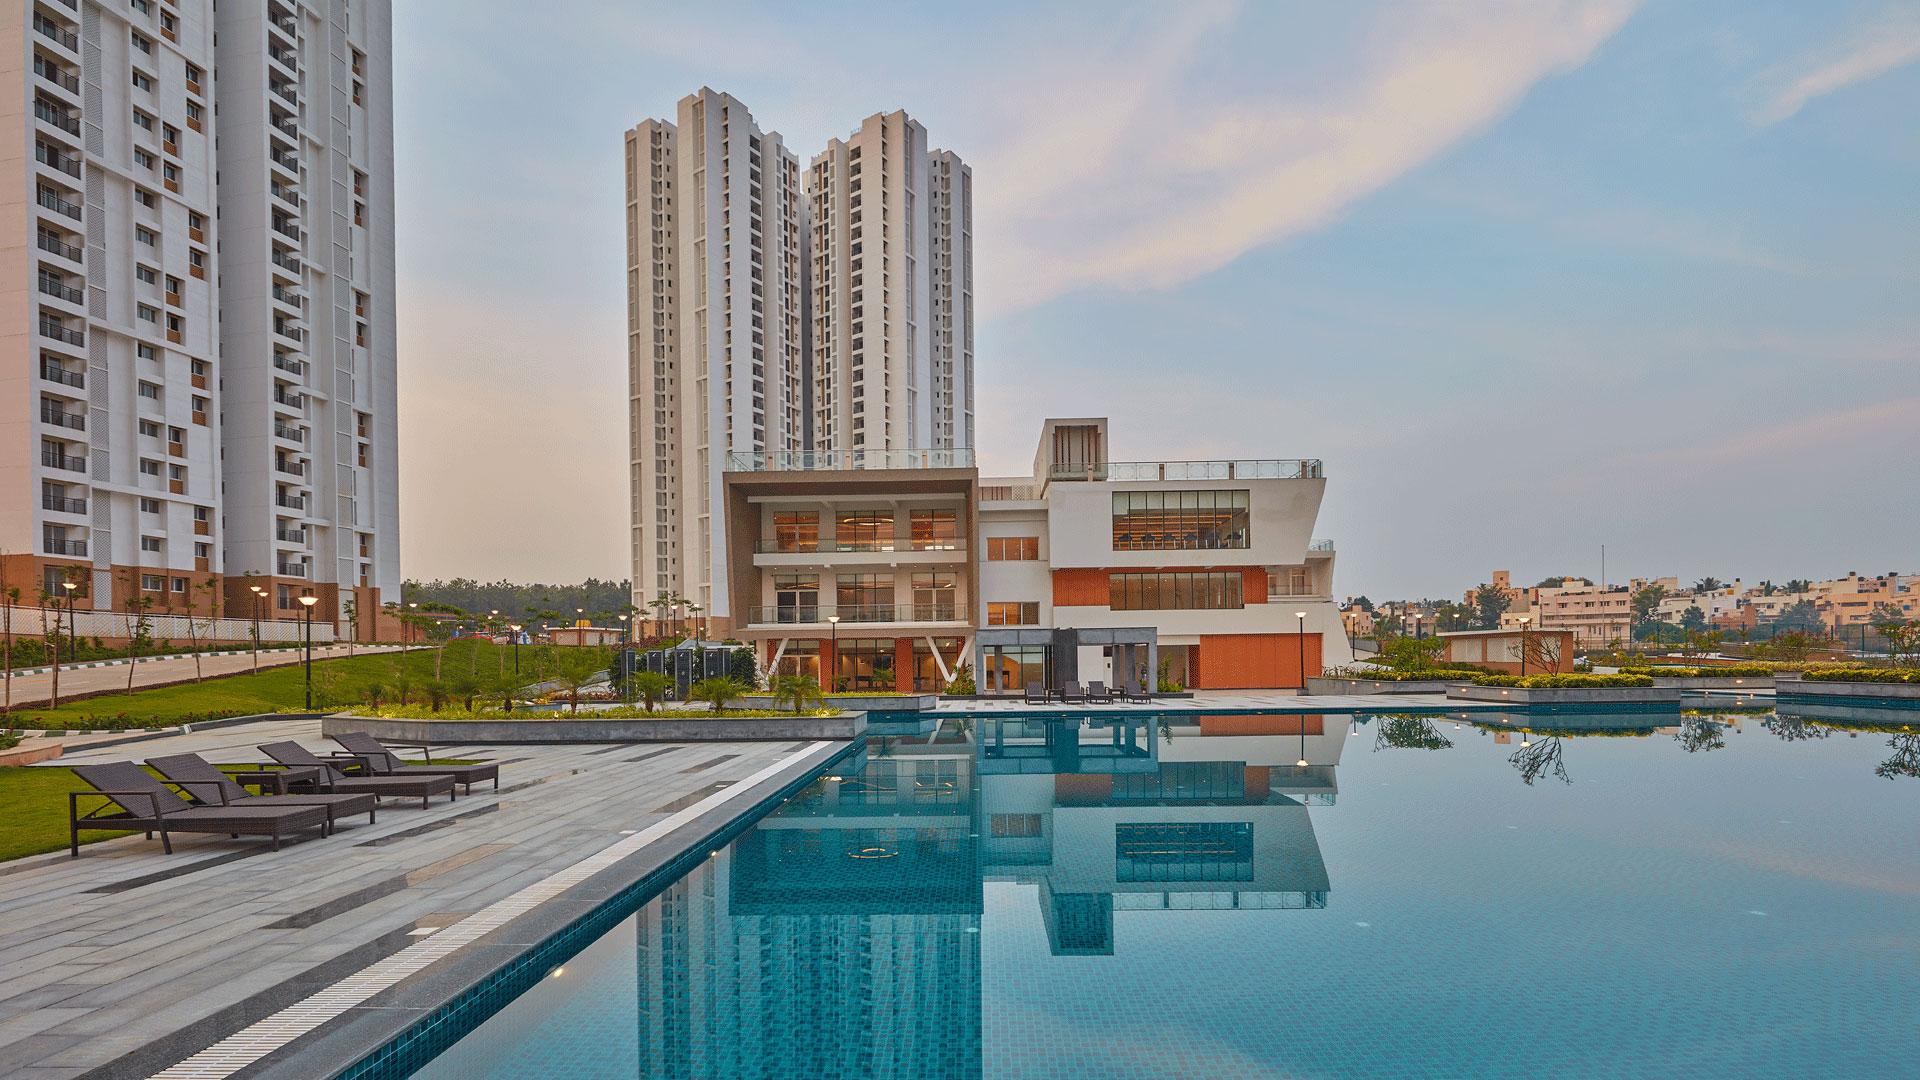 prestige-falcon-city-Kanakapura-rd-Bangalore-Image-02